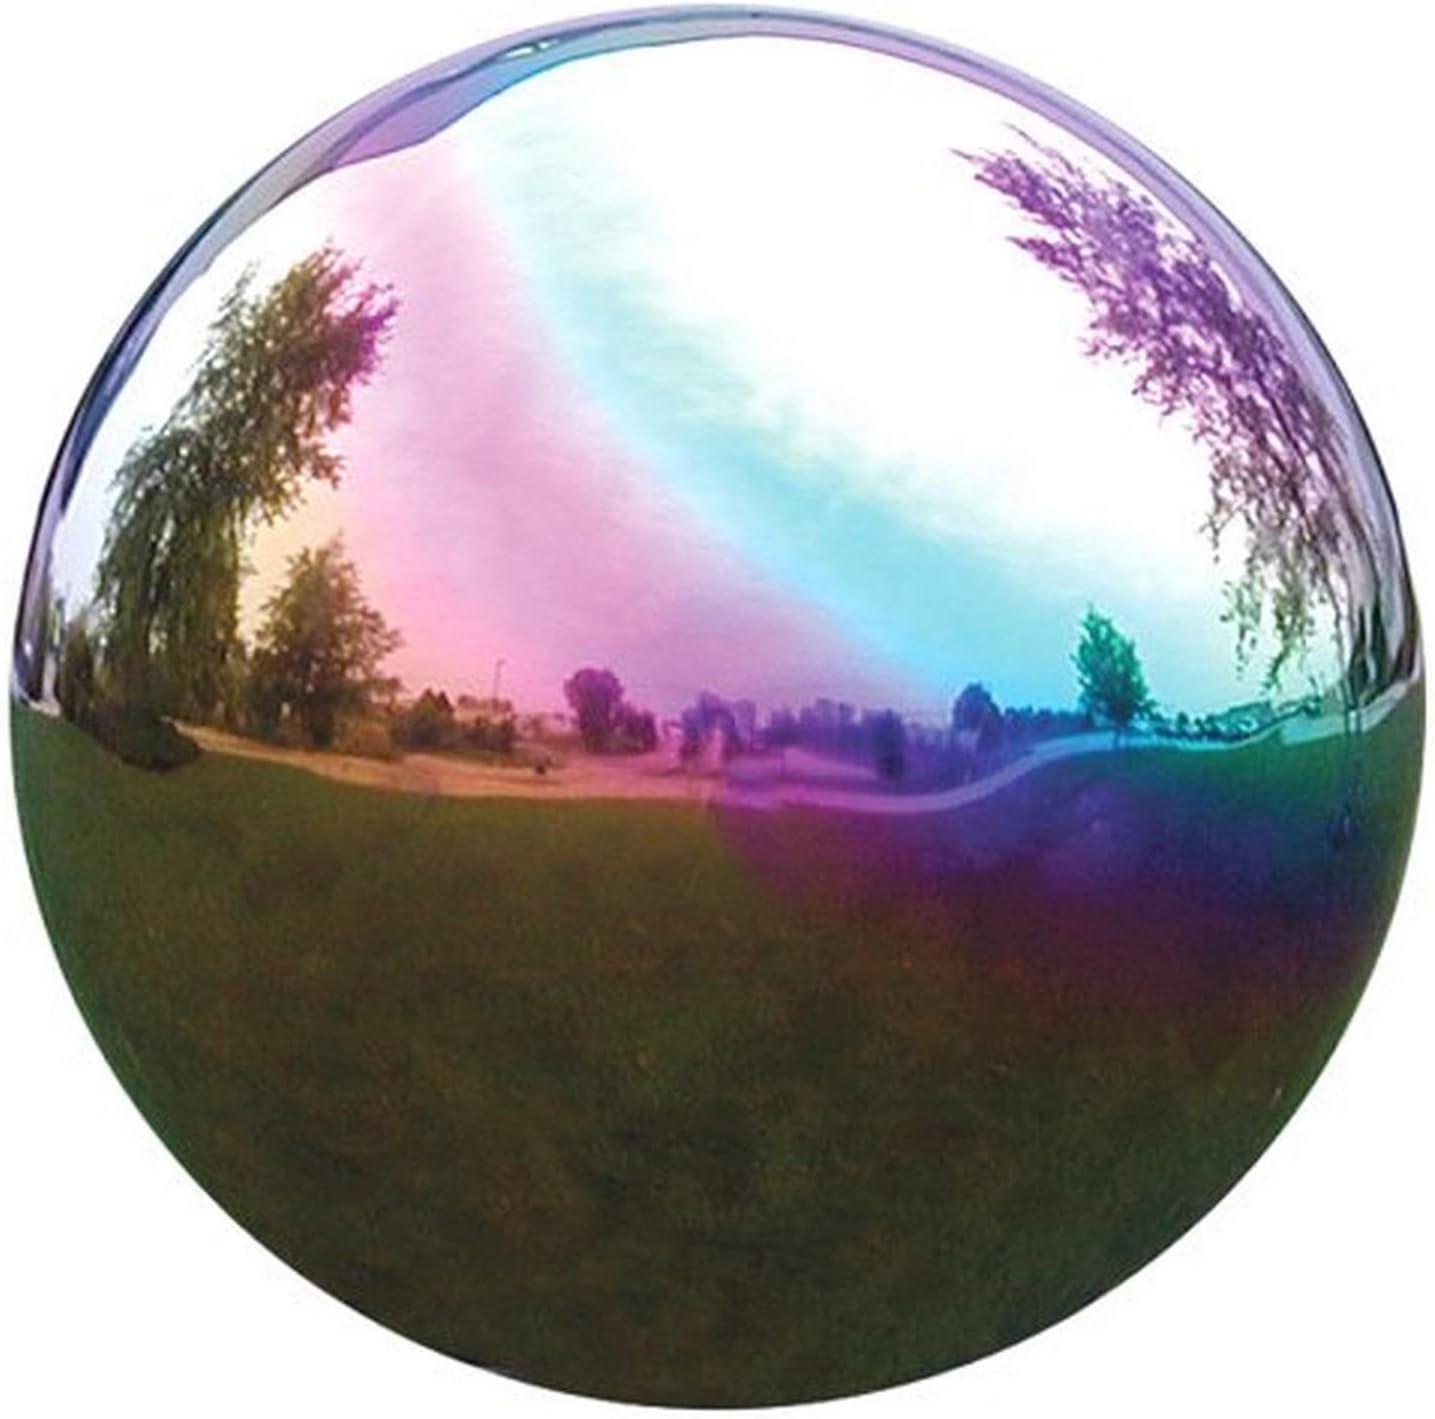 VCS RNB10 Mirror Ball 10-Inch Rainbow Stainless Steel Gazing Glo